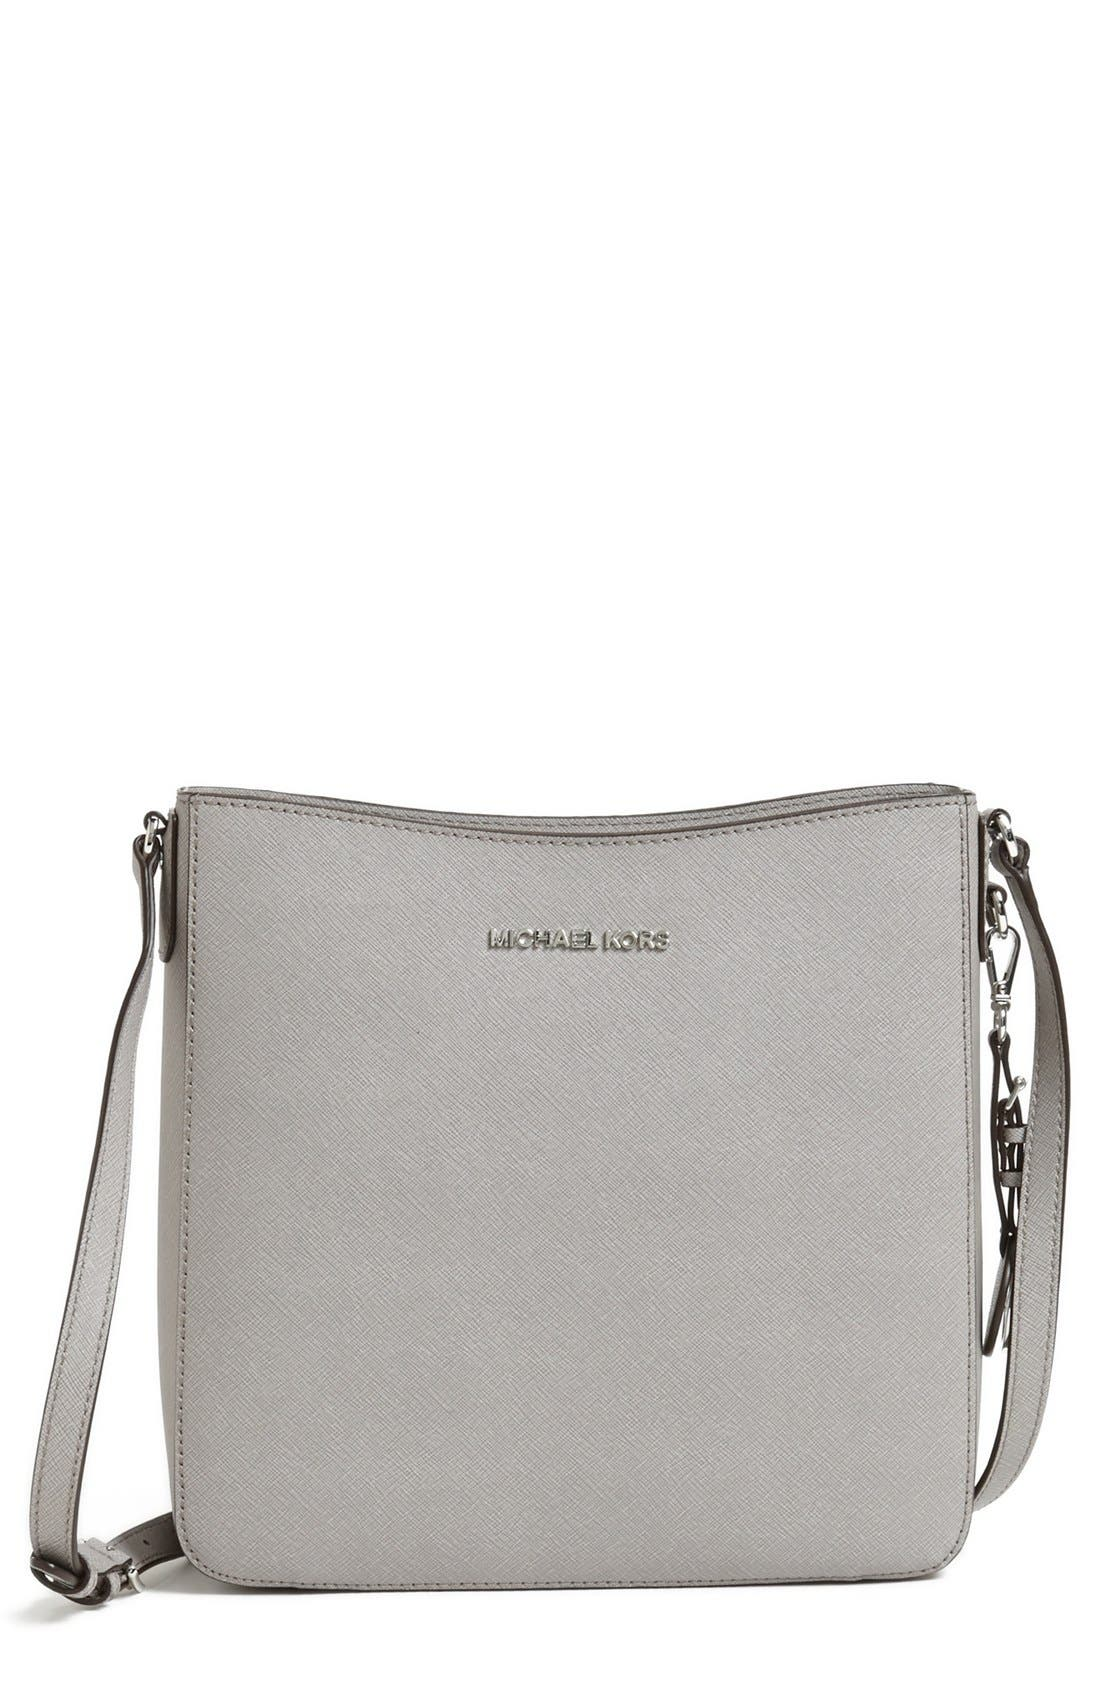 Alternate Image 1 Selected - MICHAEL Michael Kors 'Large Jet Set' Crossbody Bag